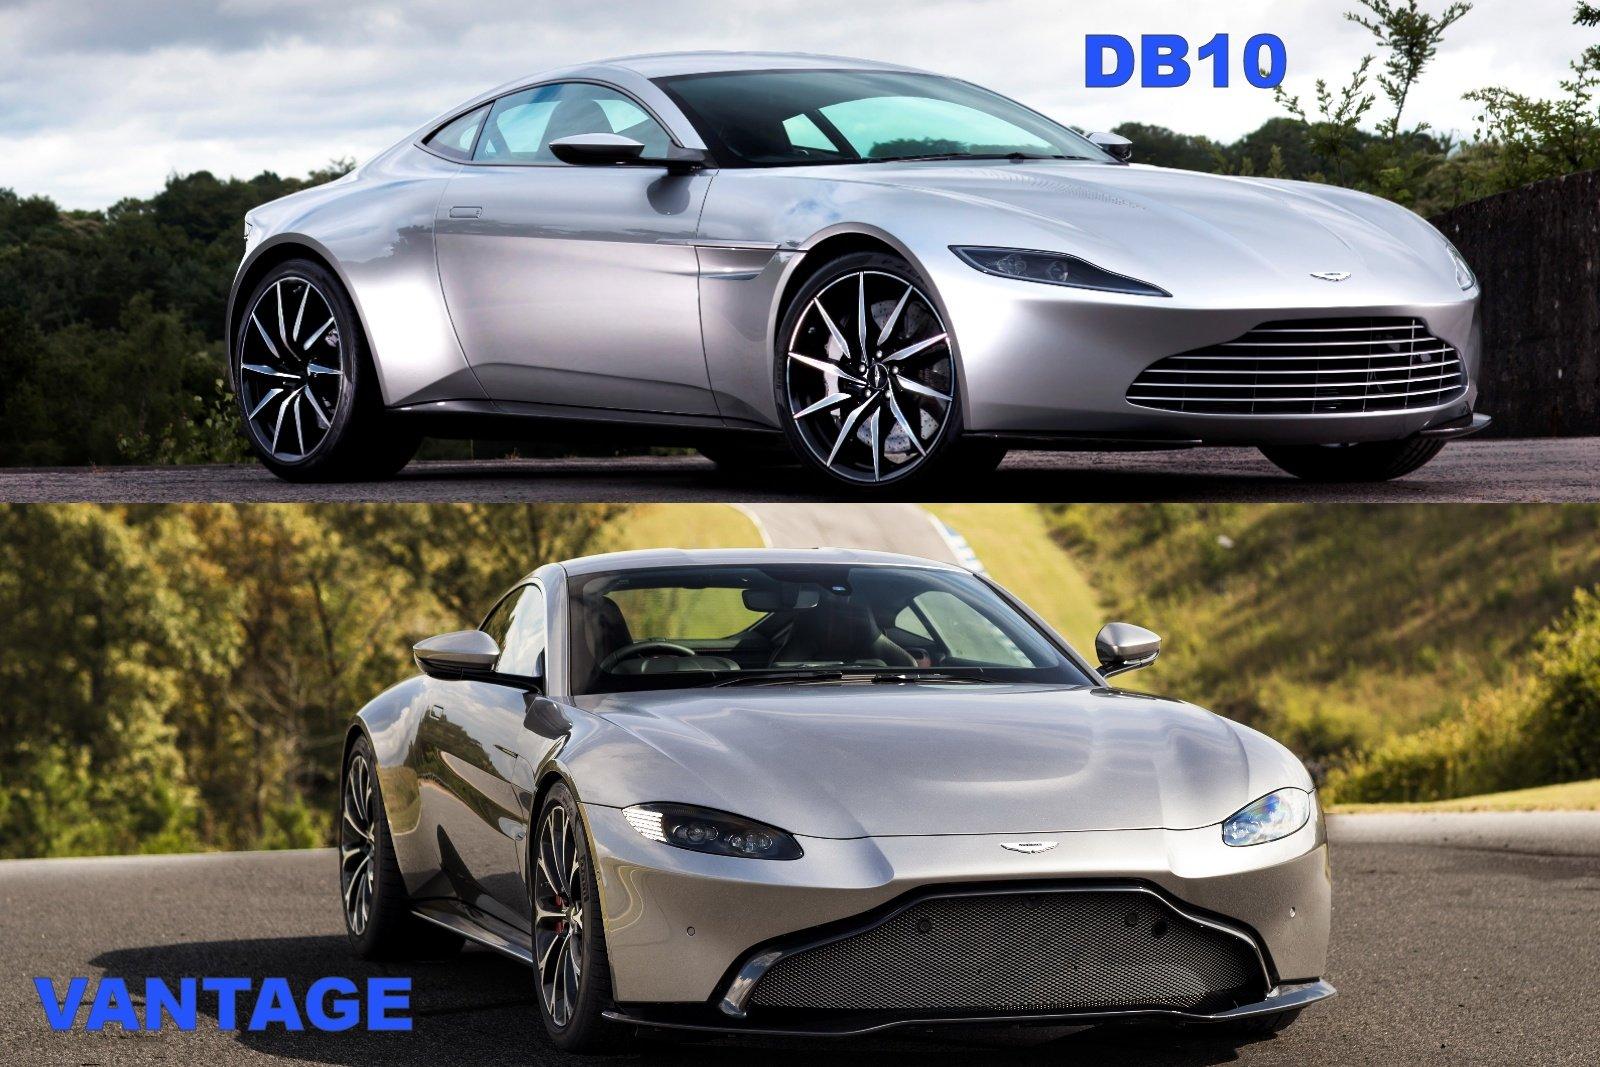 db10-vs-vantage-apertura.jpg